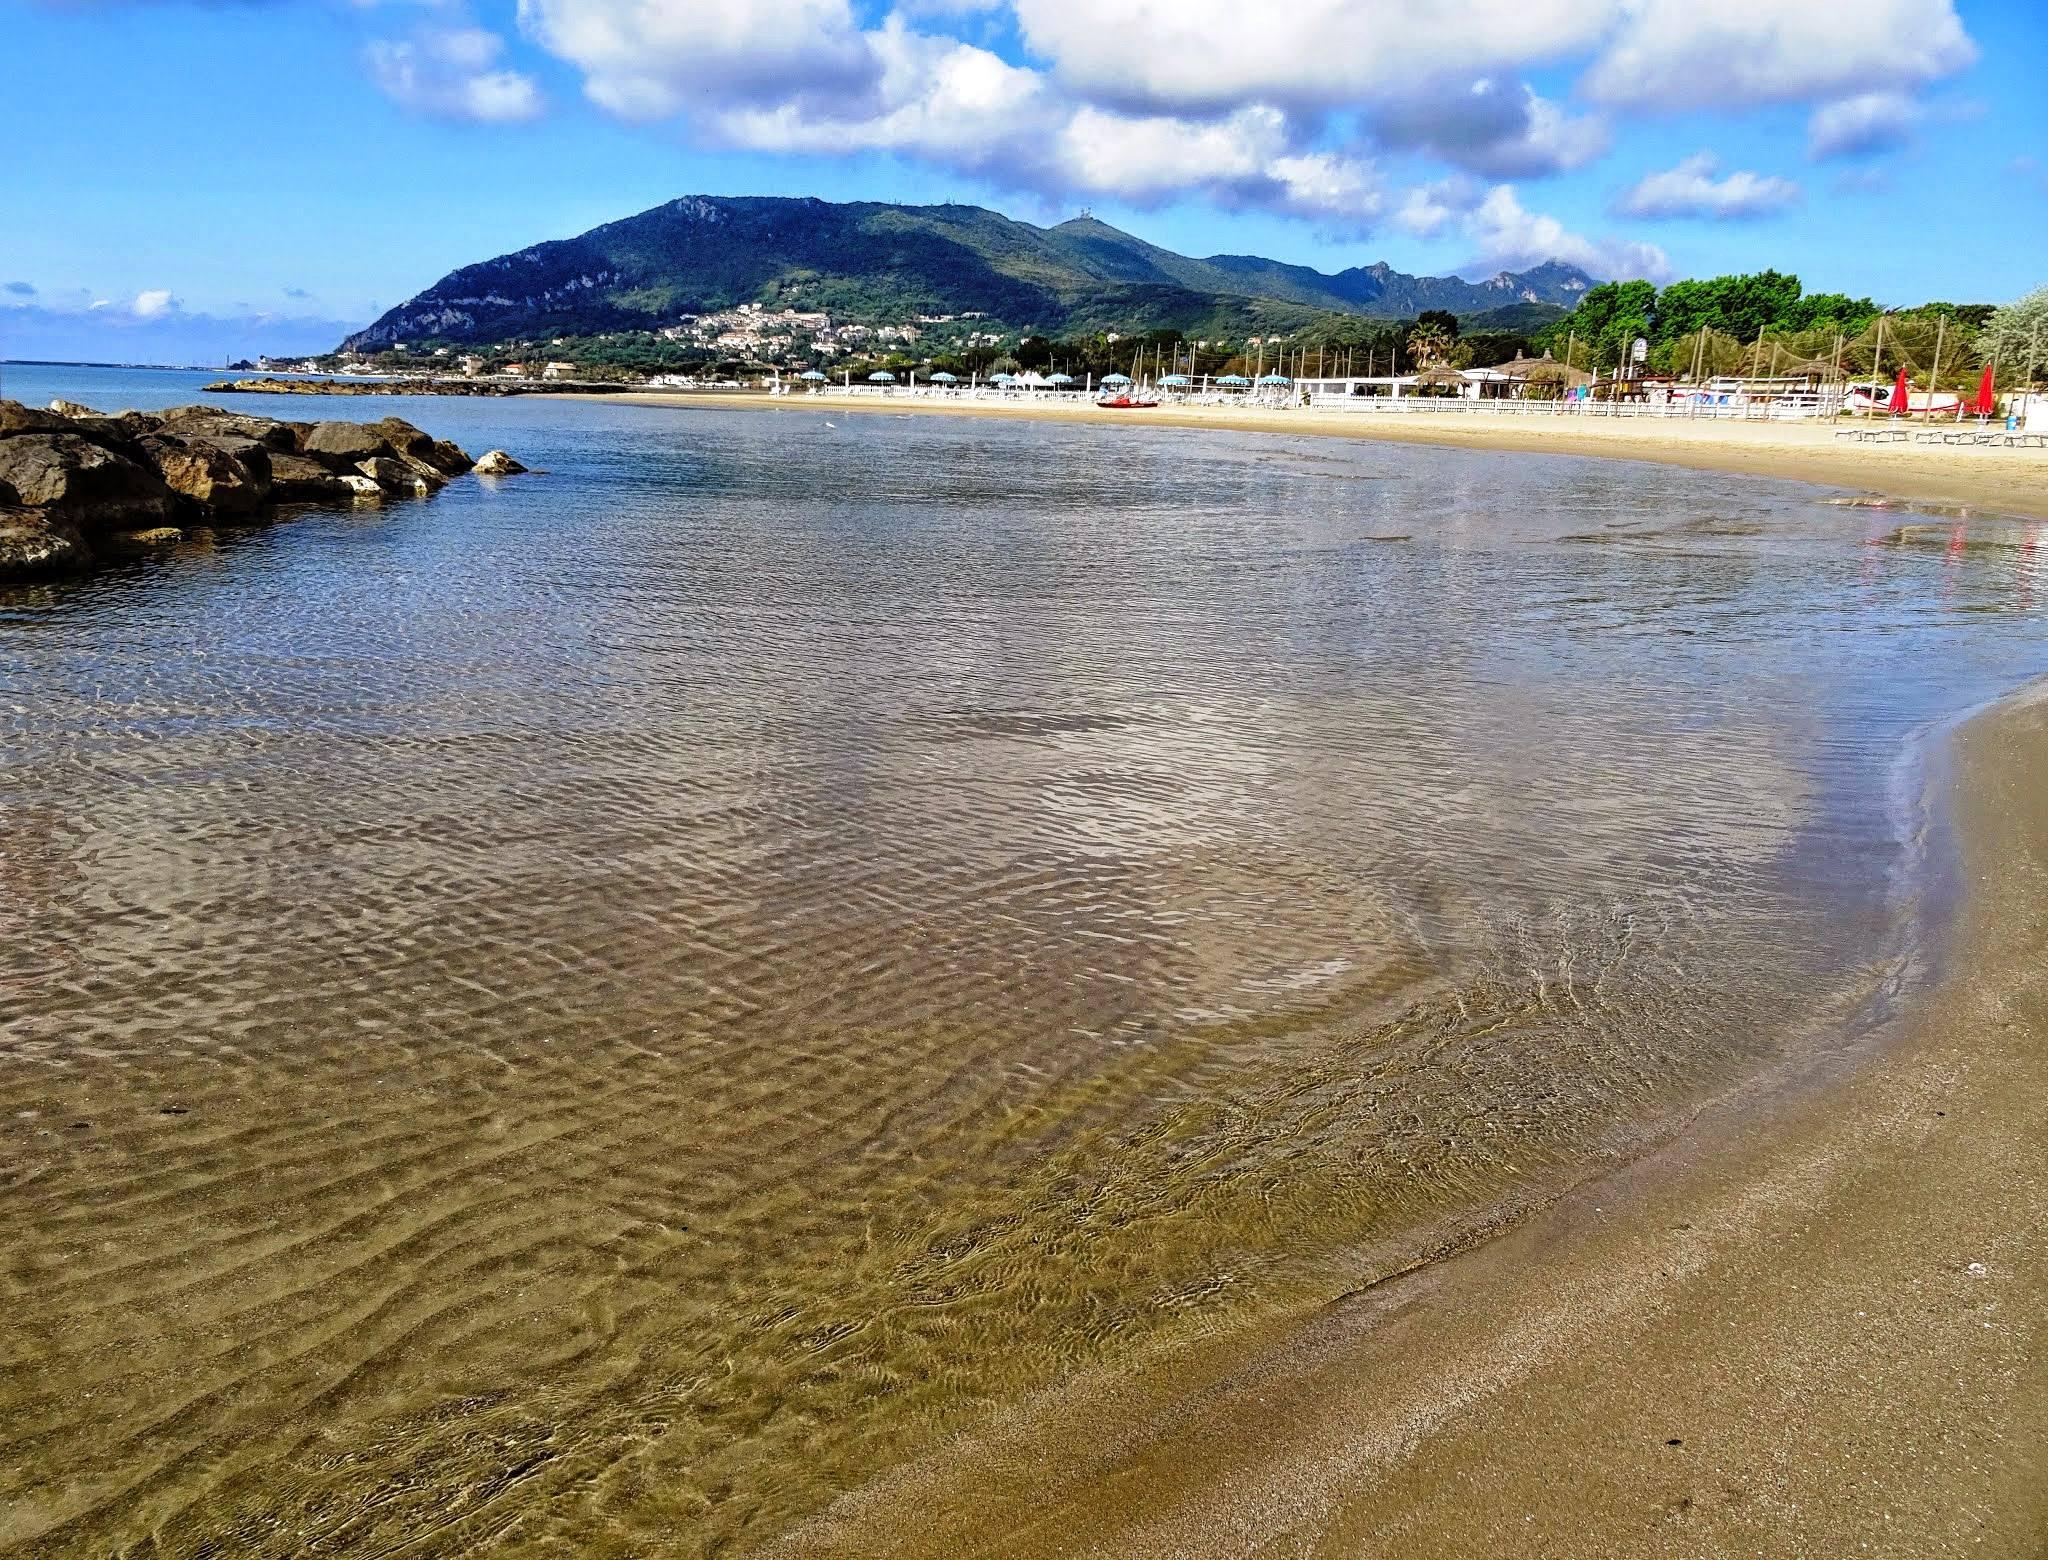 san felice circeo spiagge libere